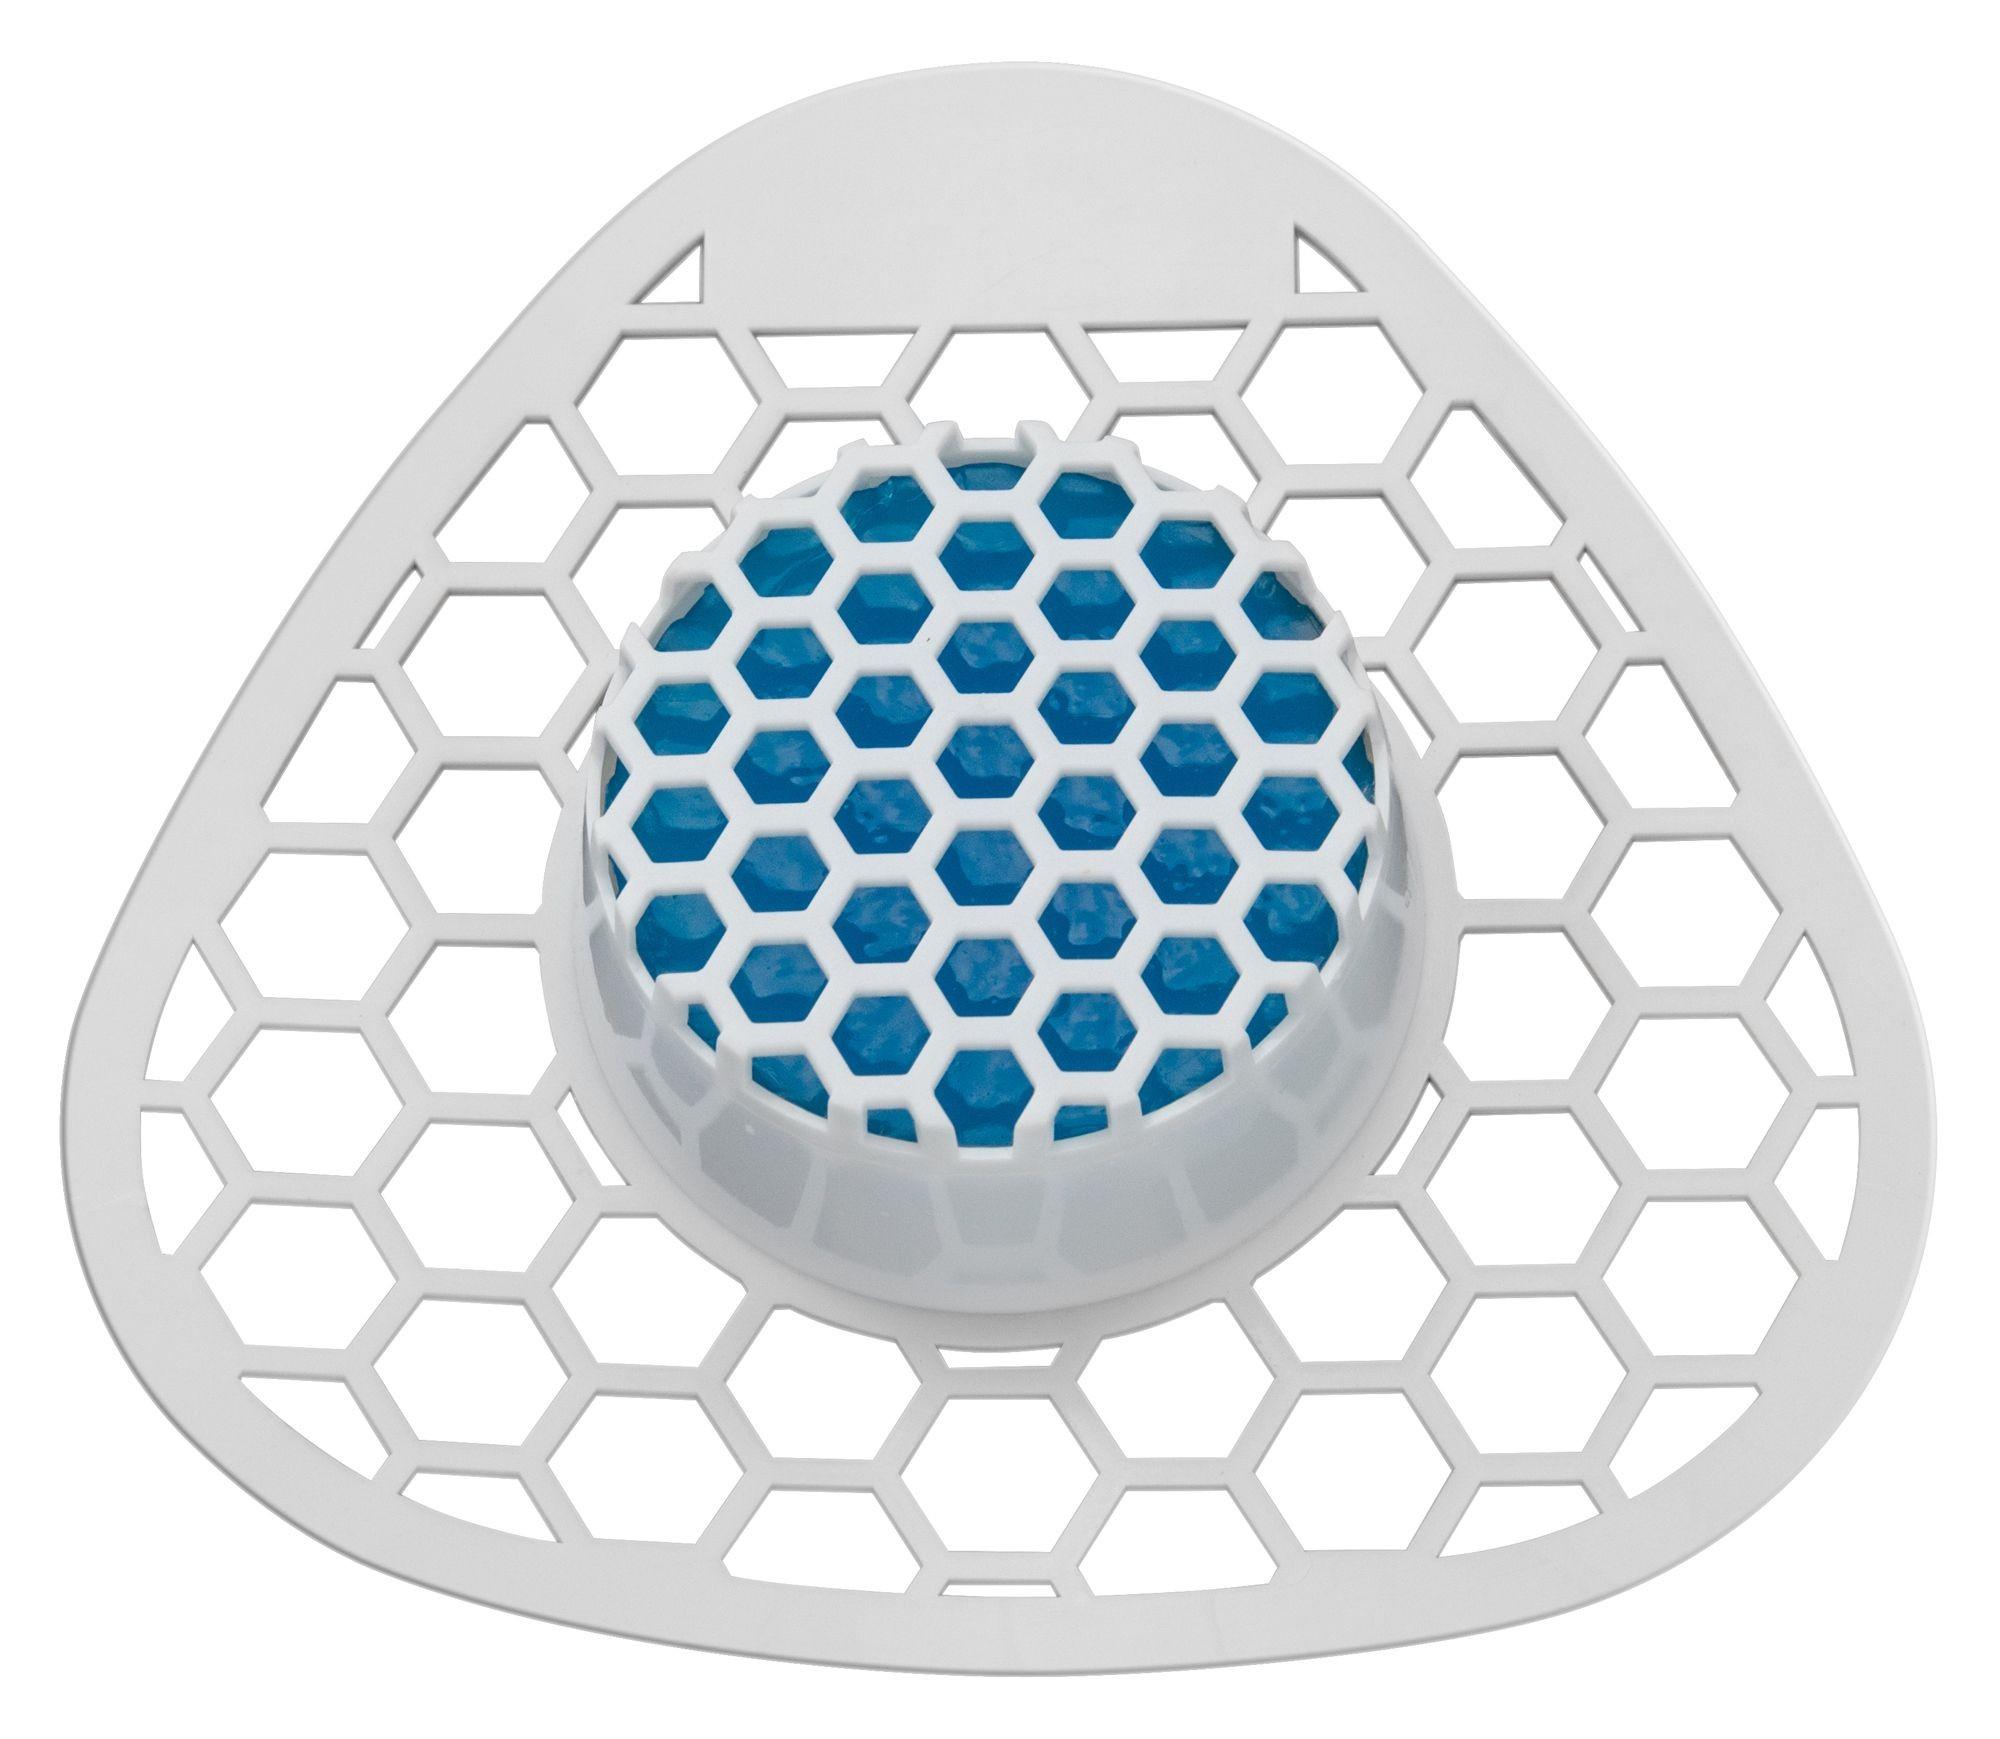 Winco USF-4 Urinal Screen with Deodorizer Block